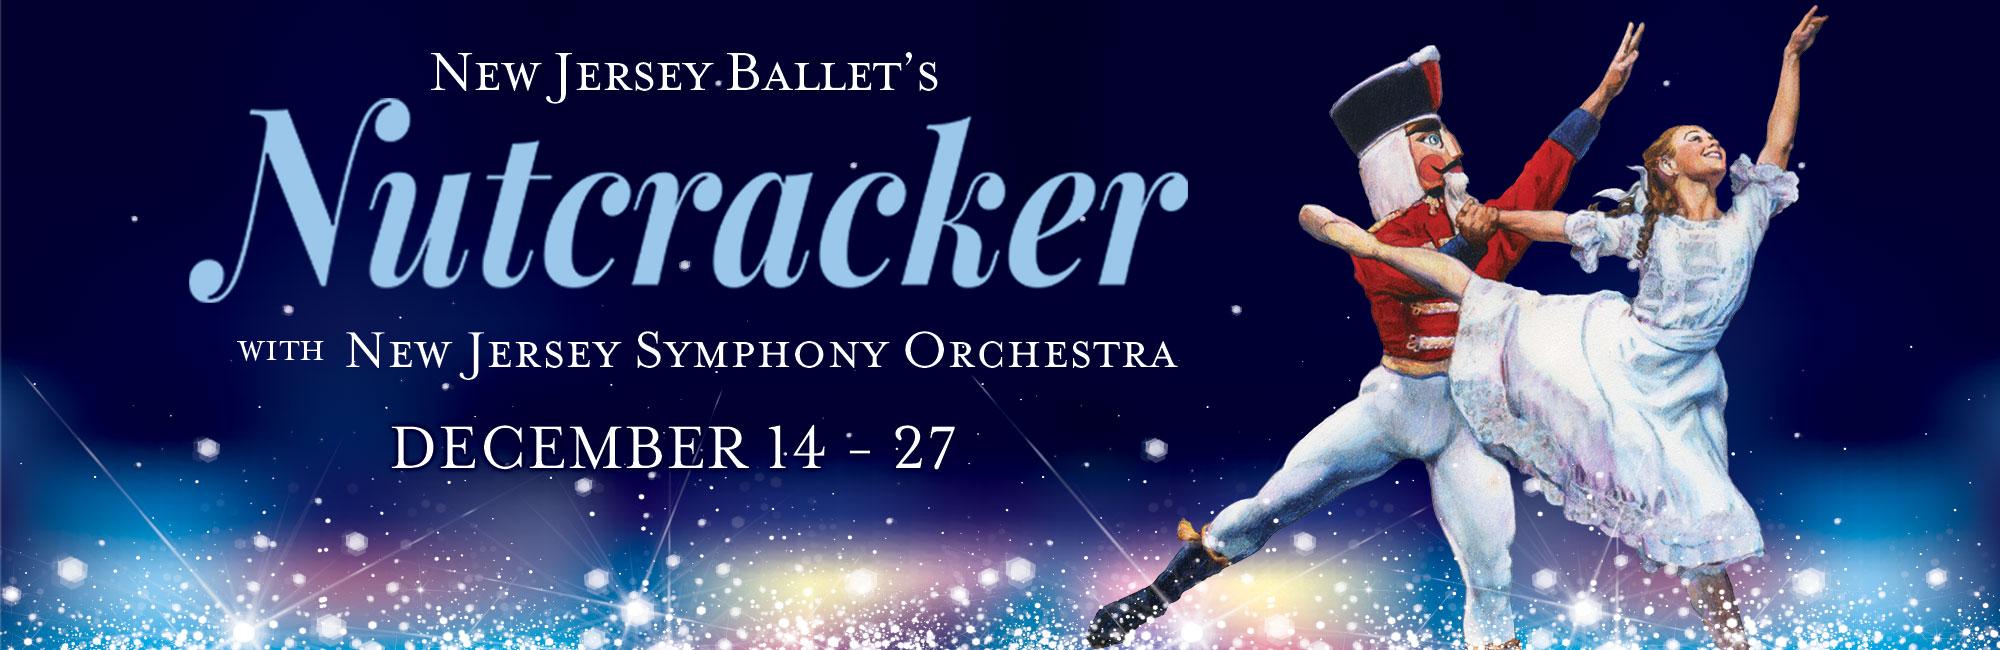 New Jersey Ballet's Nutcracker with New Jersey Symphony Orchestra